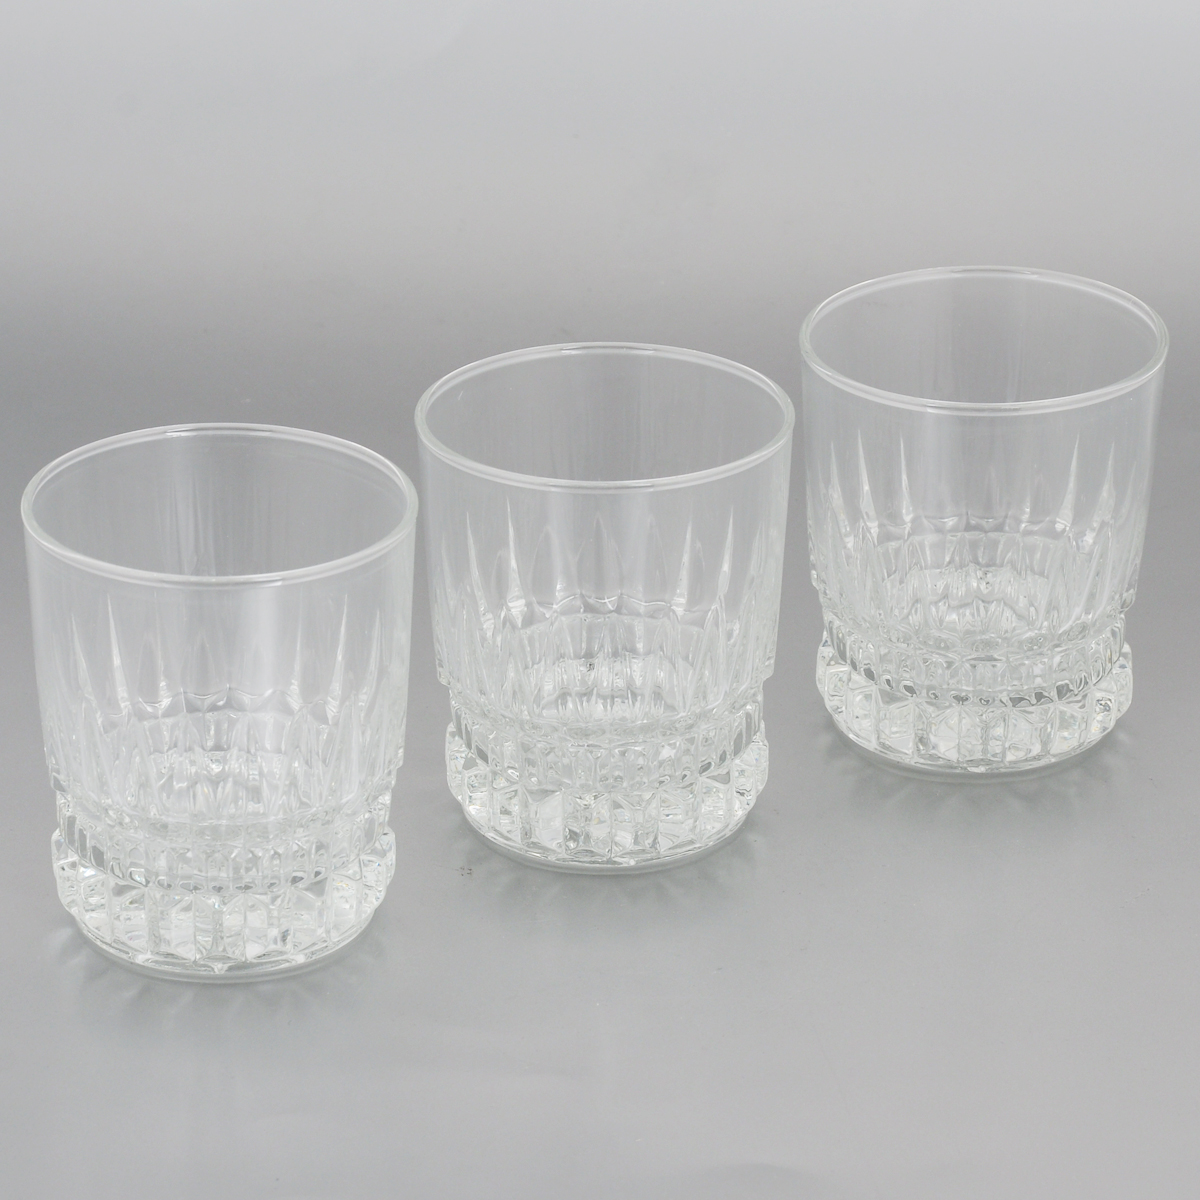 Набор стаканов Luminarc Imperator, 300 мл, 3 шт набор стаканов 6шт 300 мл